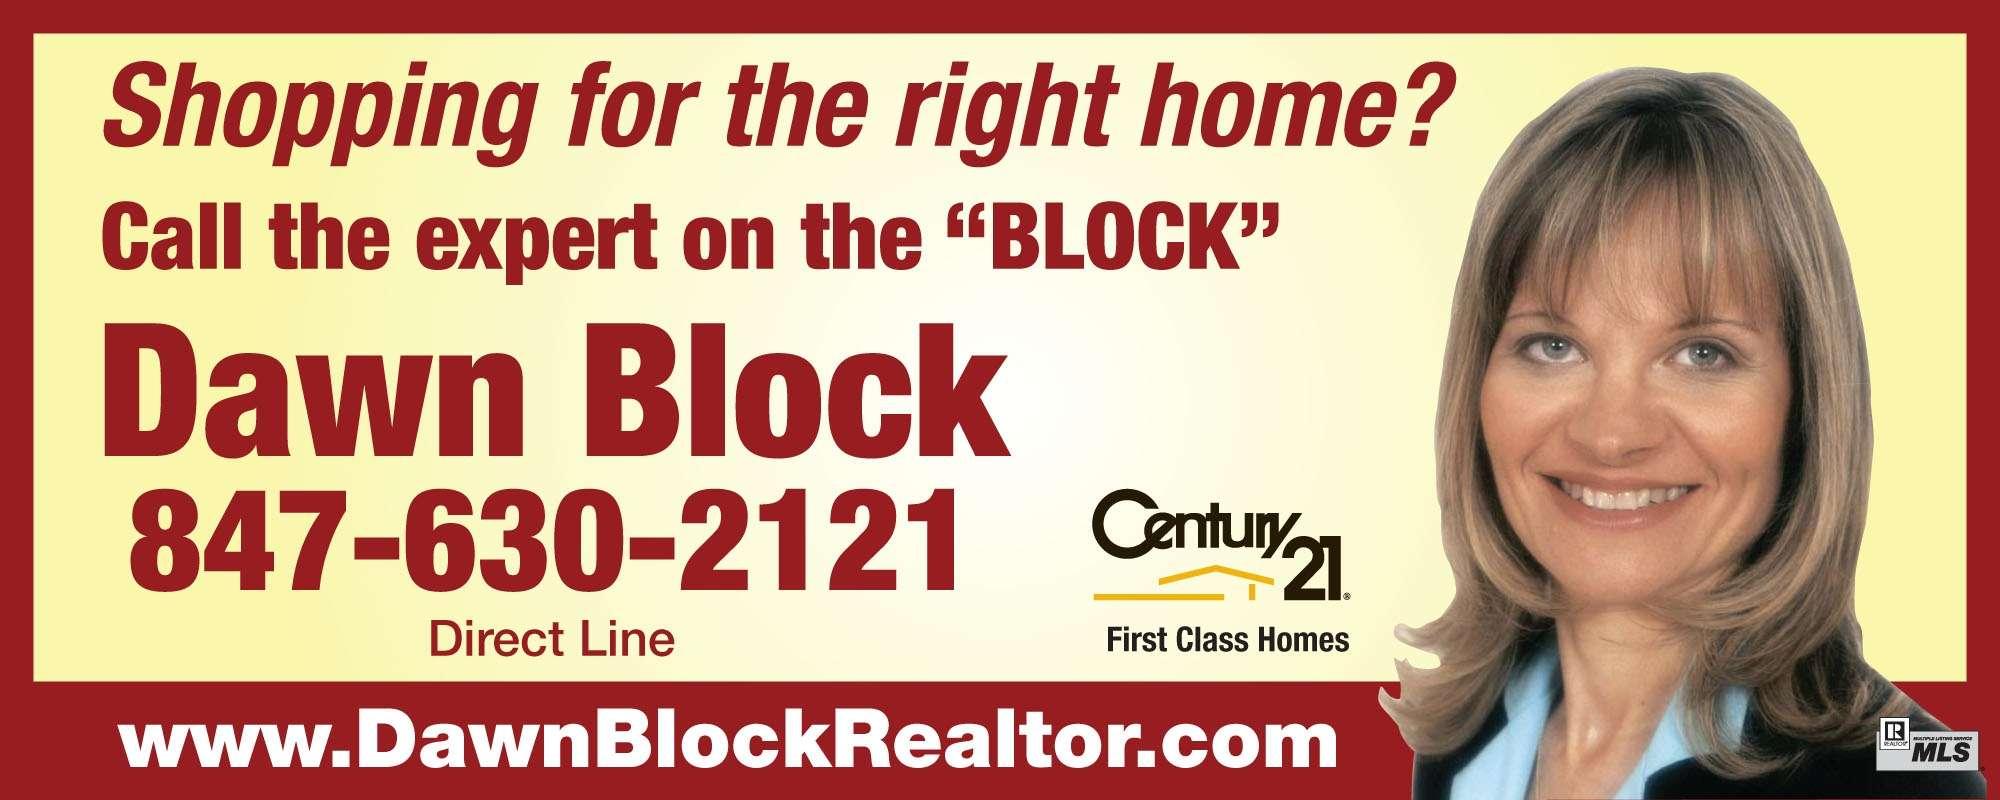 Century 21-Dawn Block